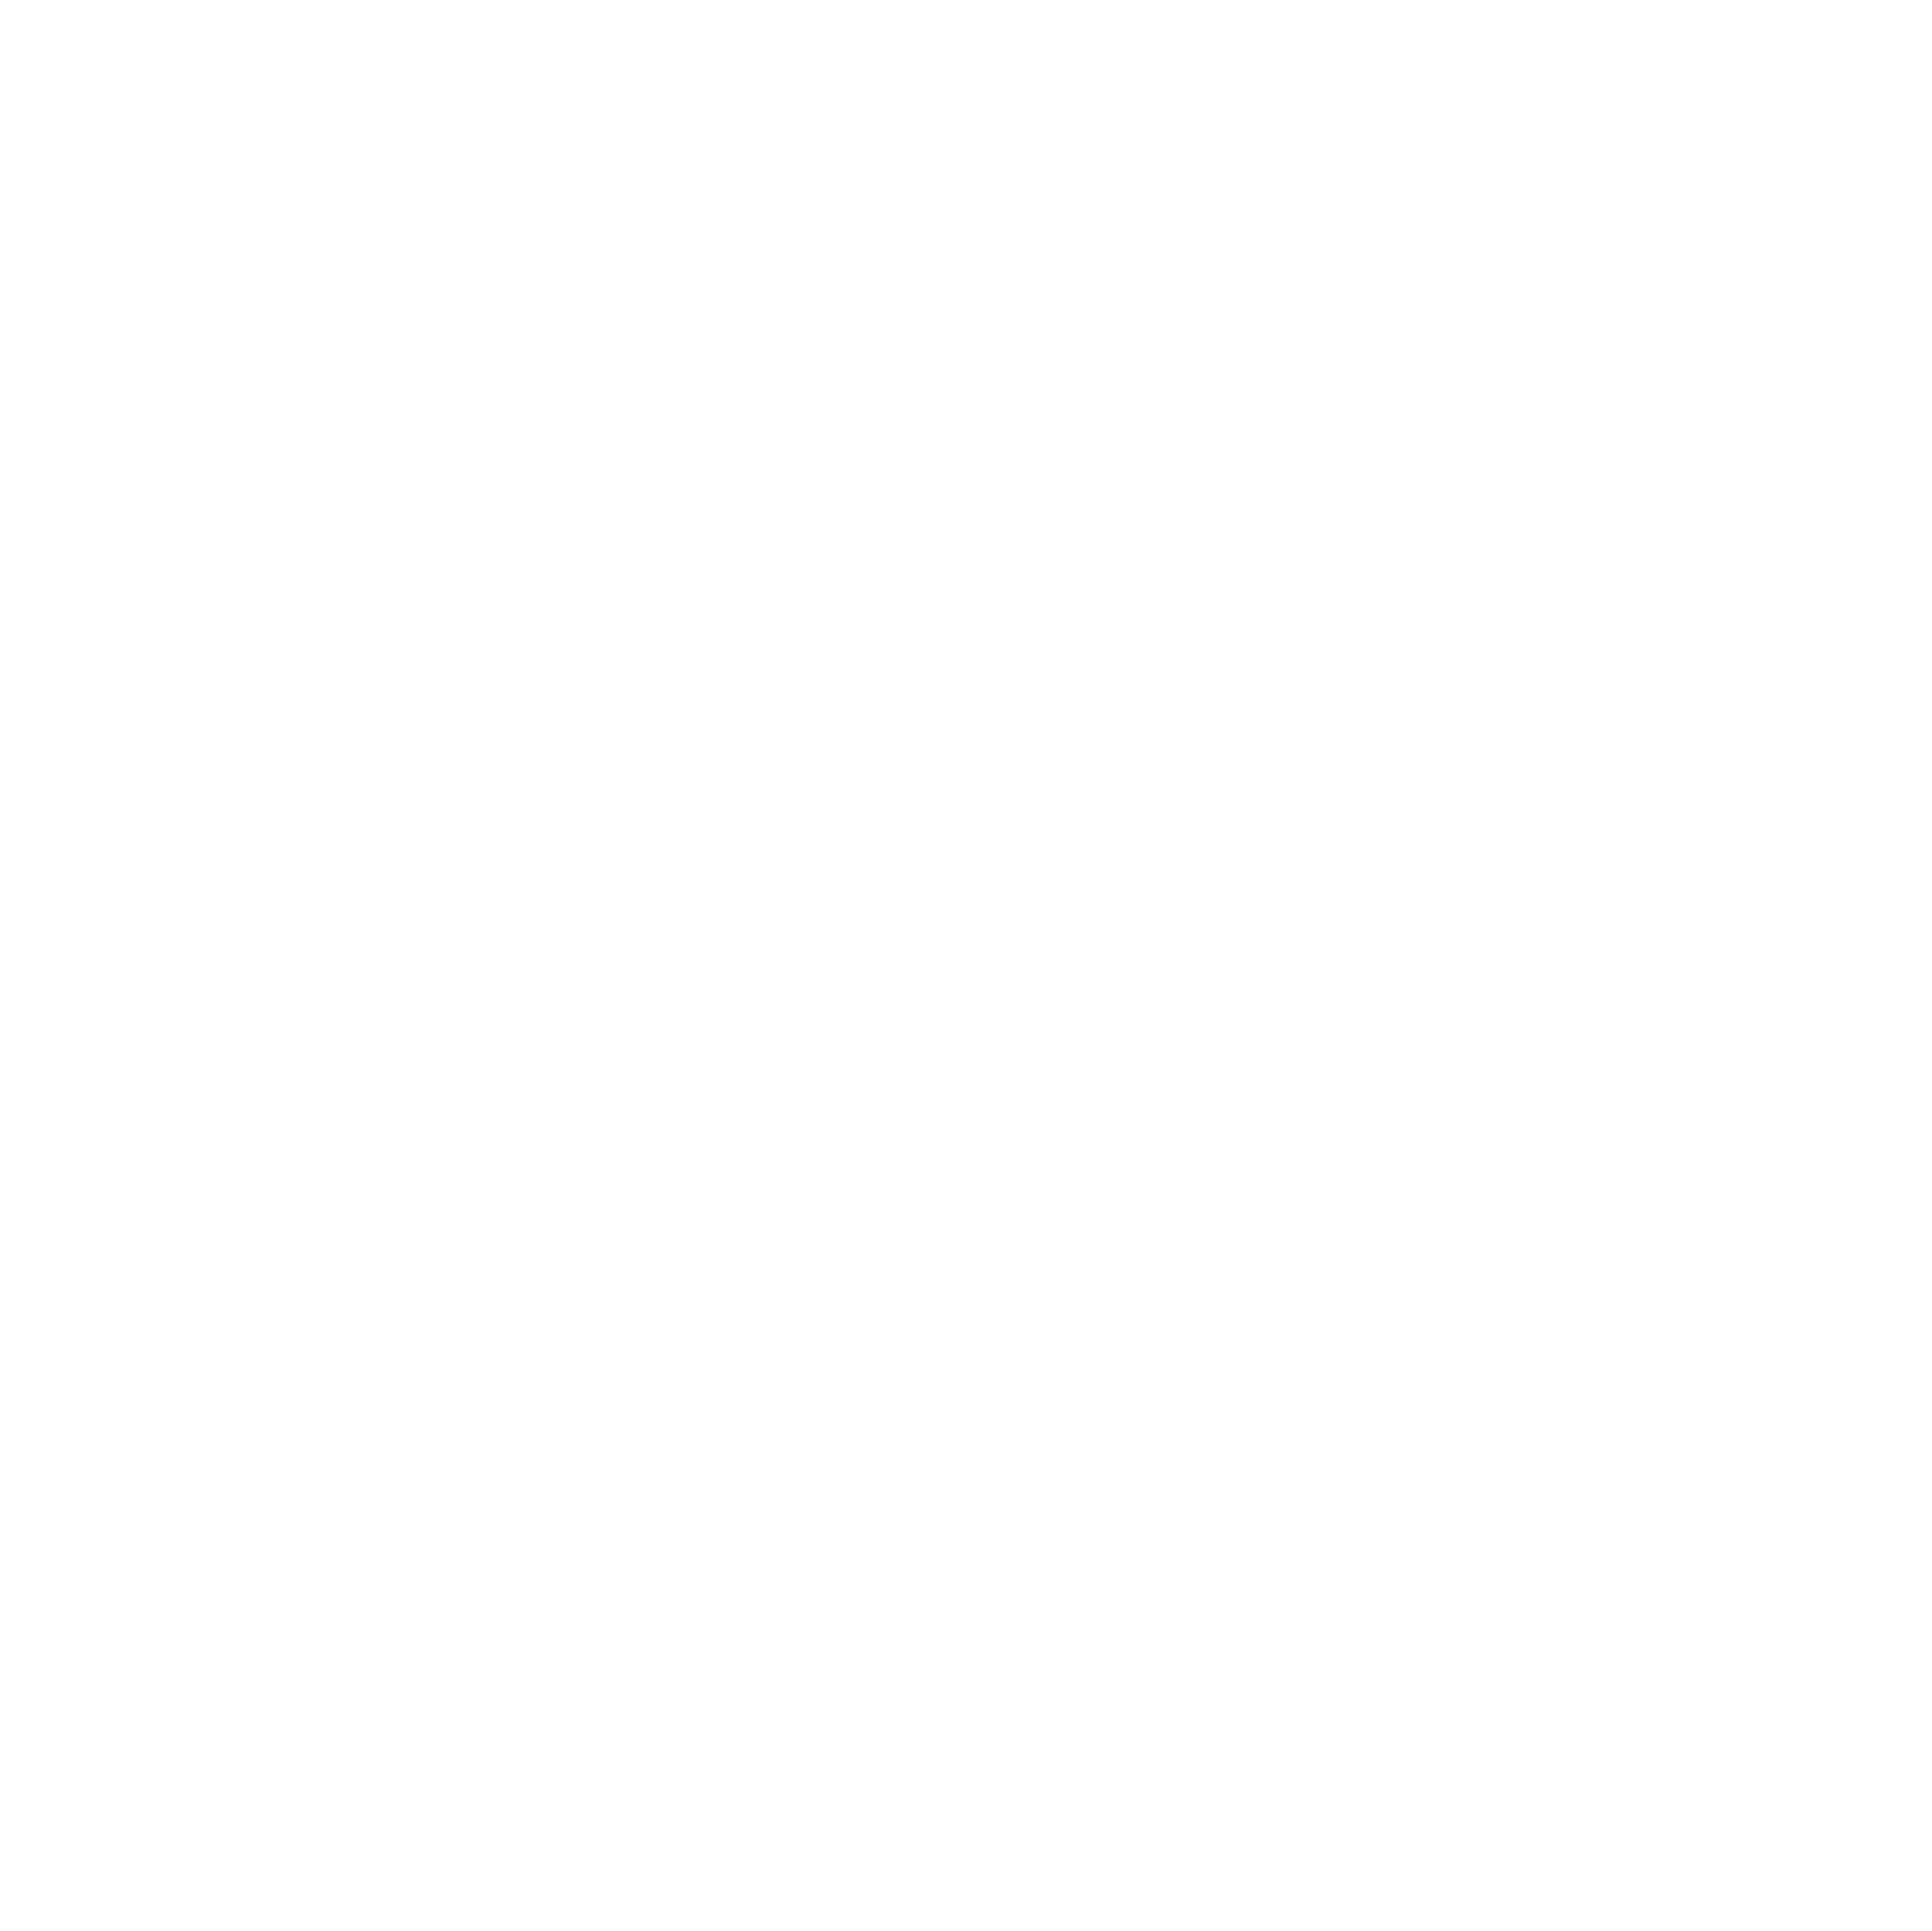 Imagine Canada Accreditation logo